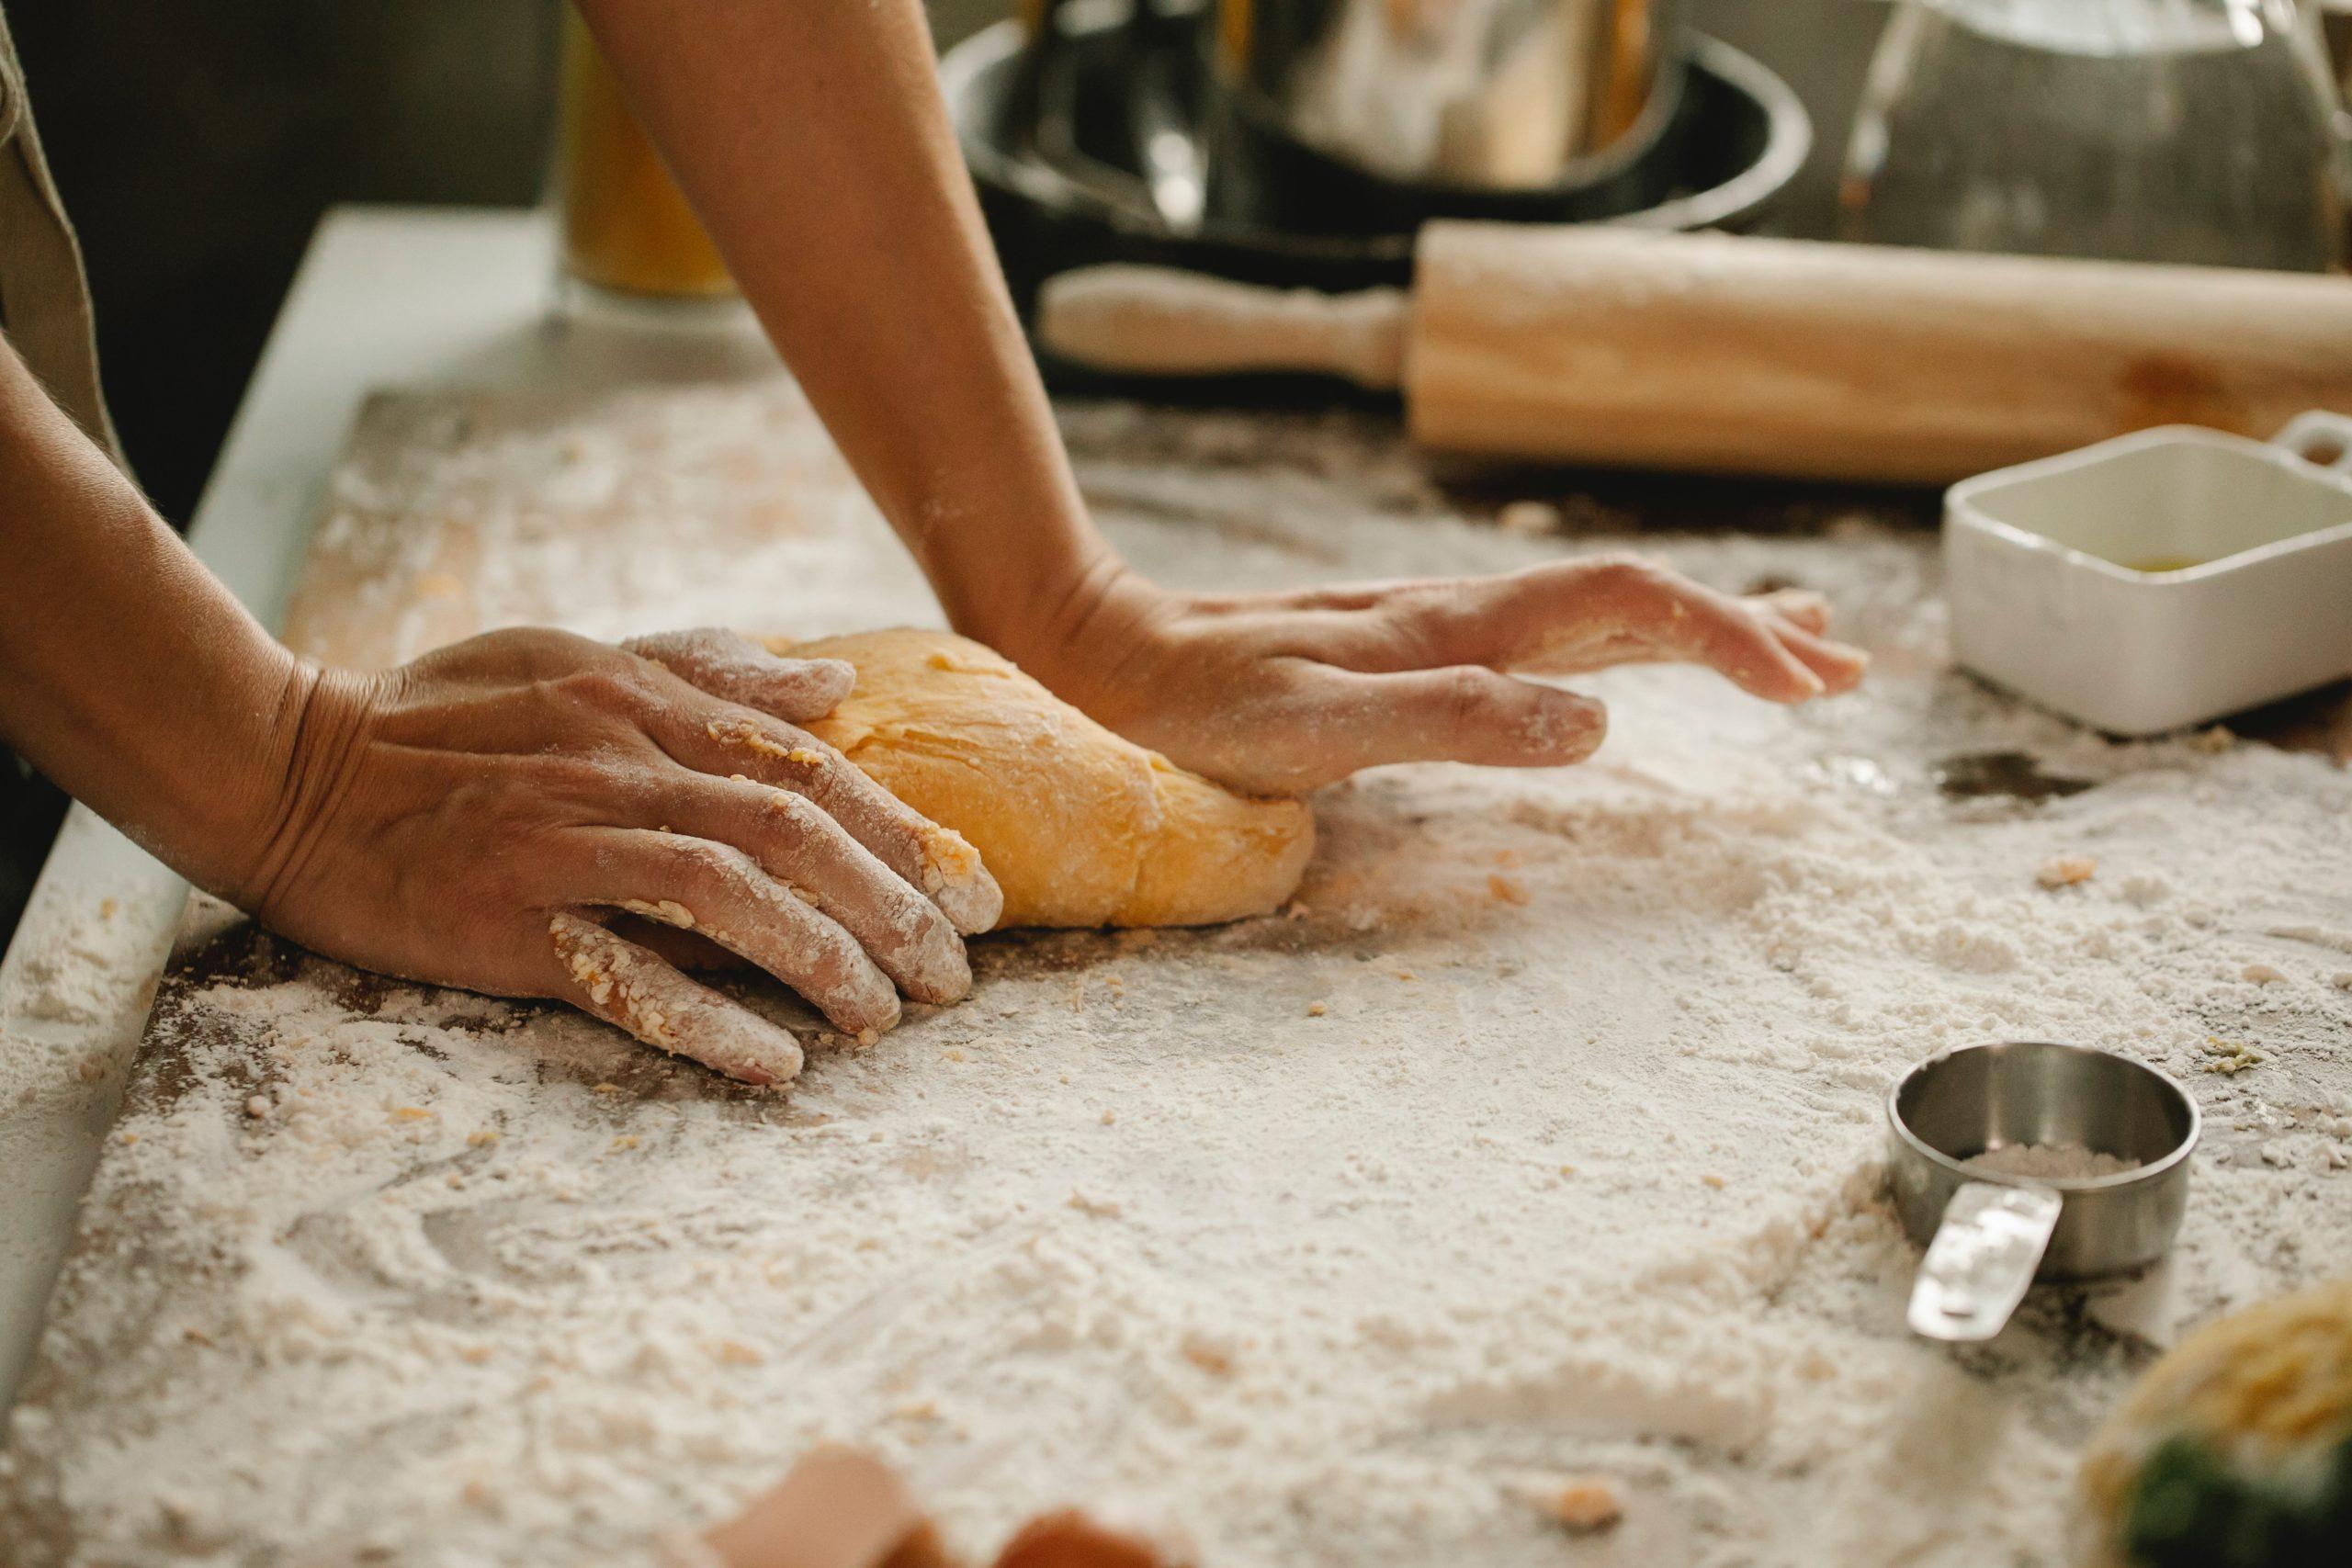 Craft Bakers Association welcomes Lisa Nicholls